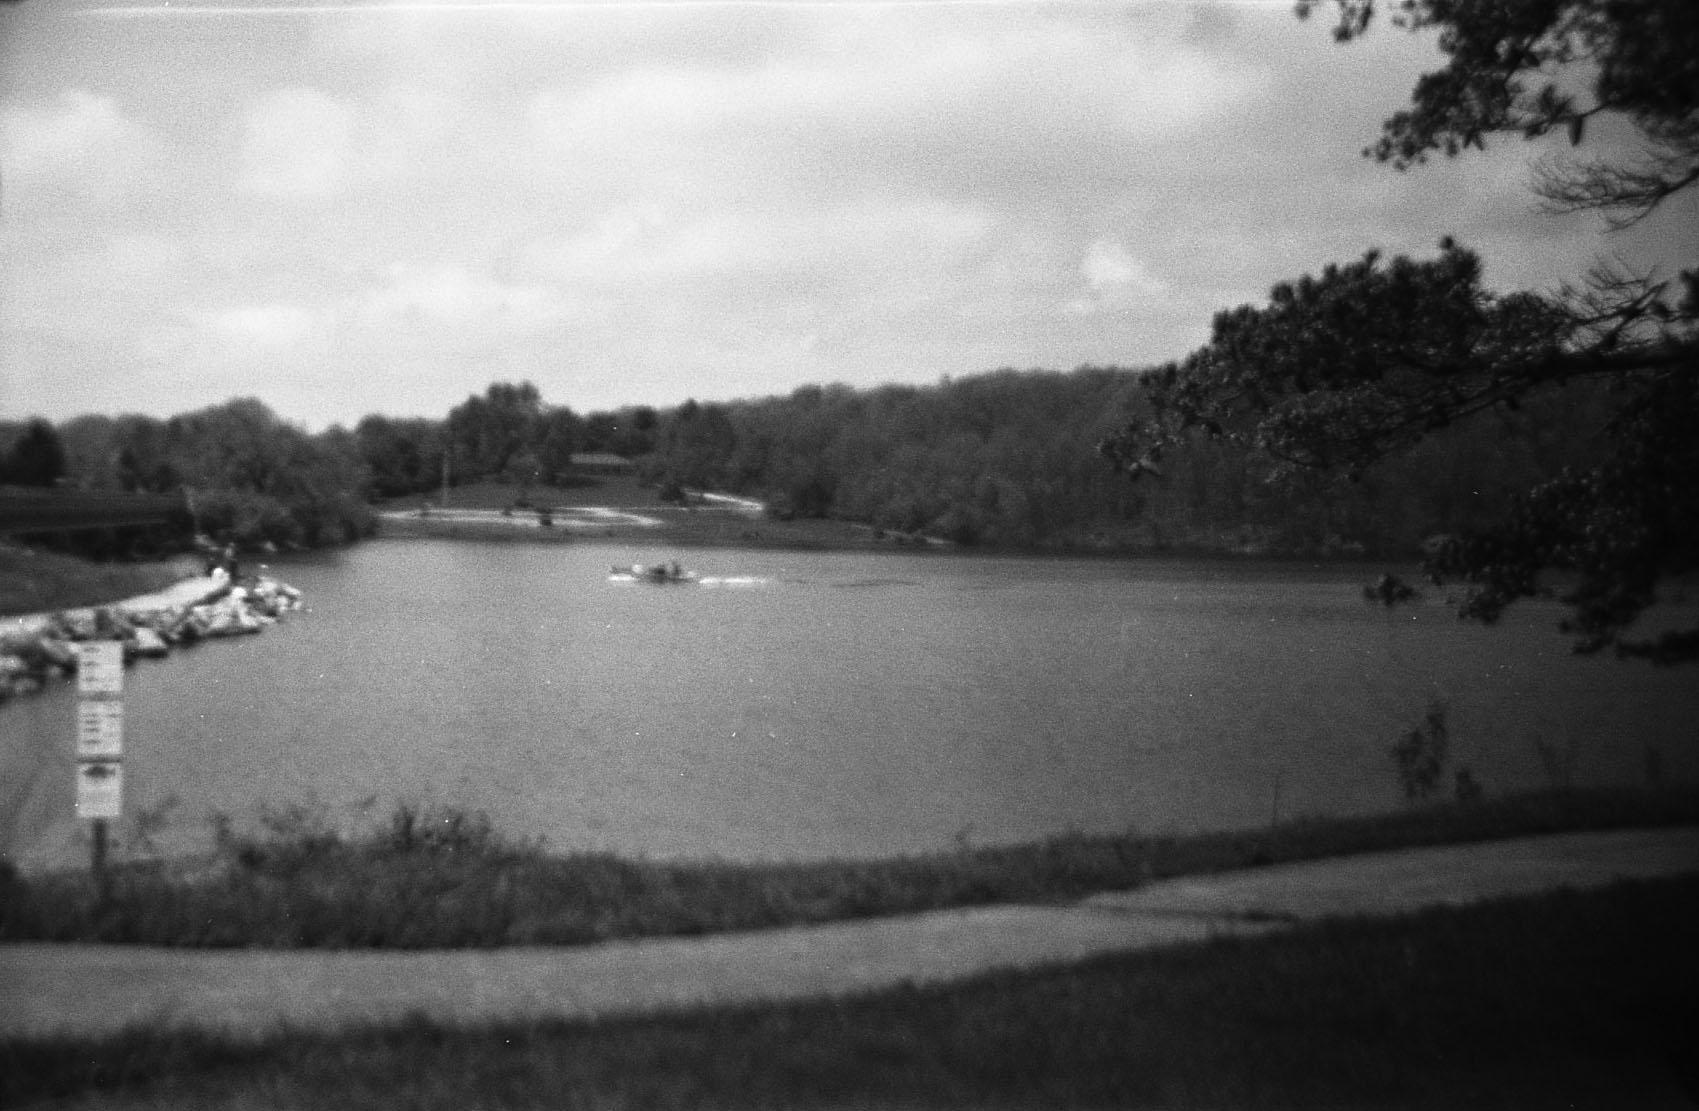 lake_marburg.jpg